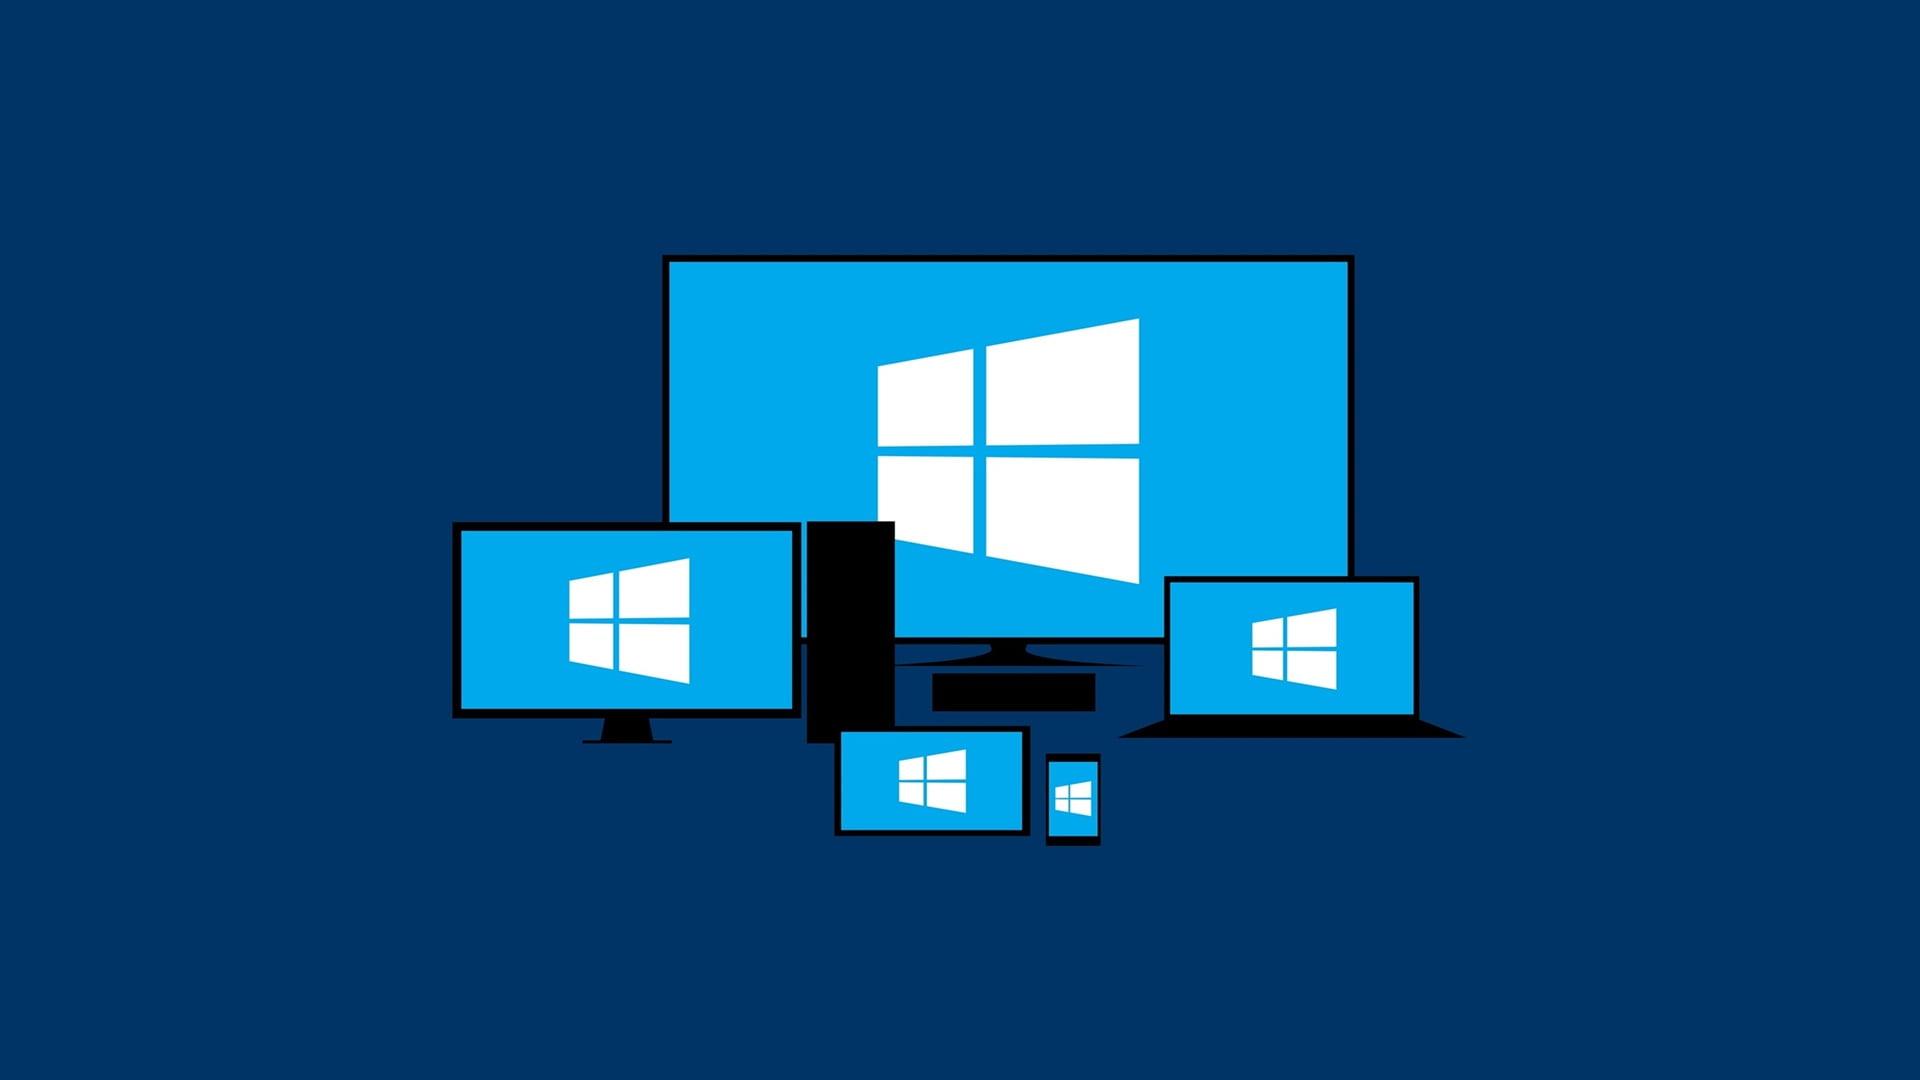 New Windows Logo Wallpaper HD